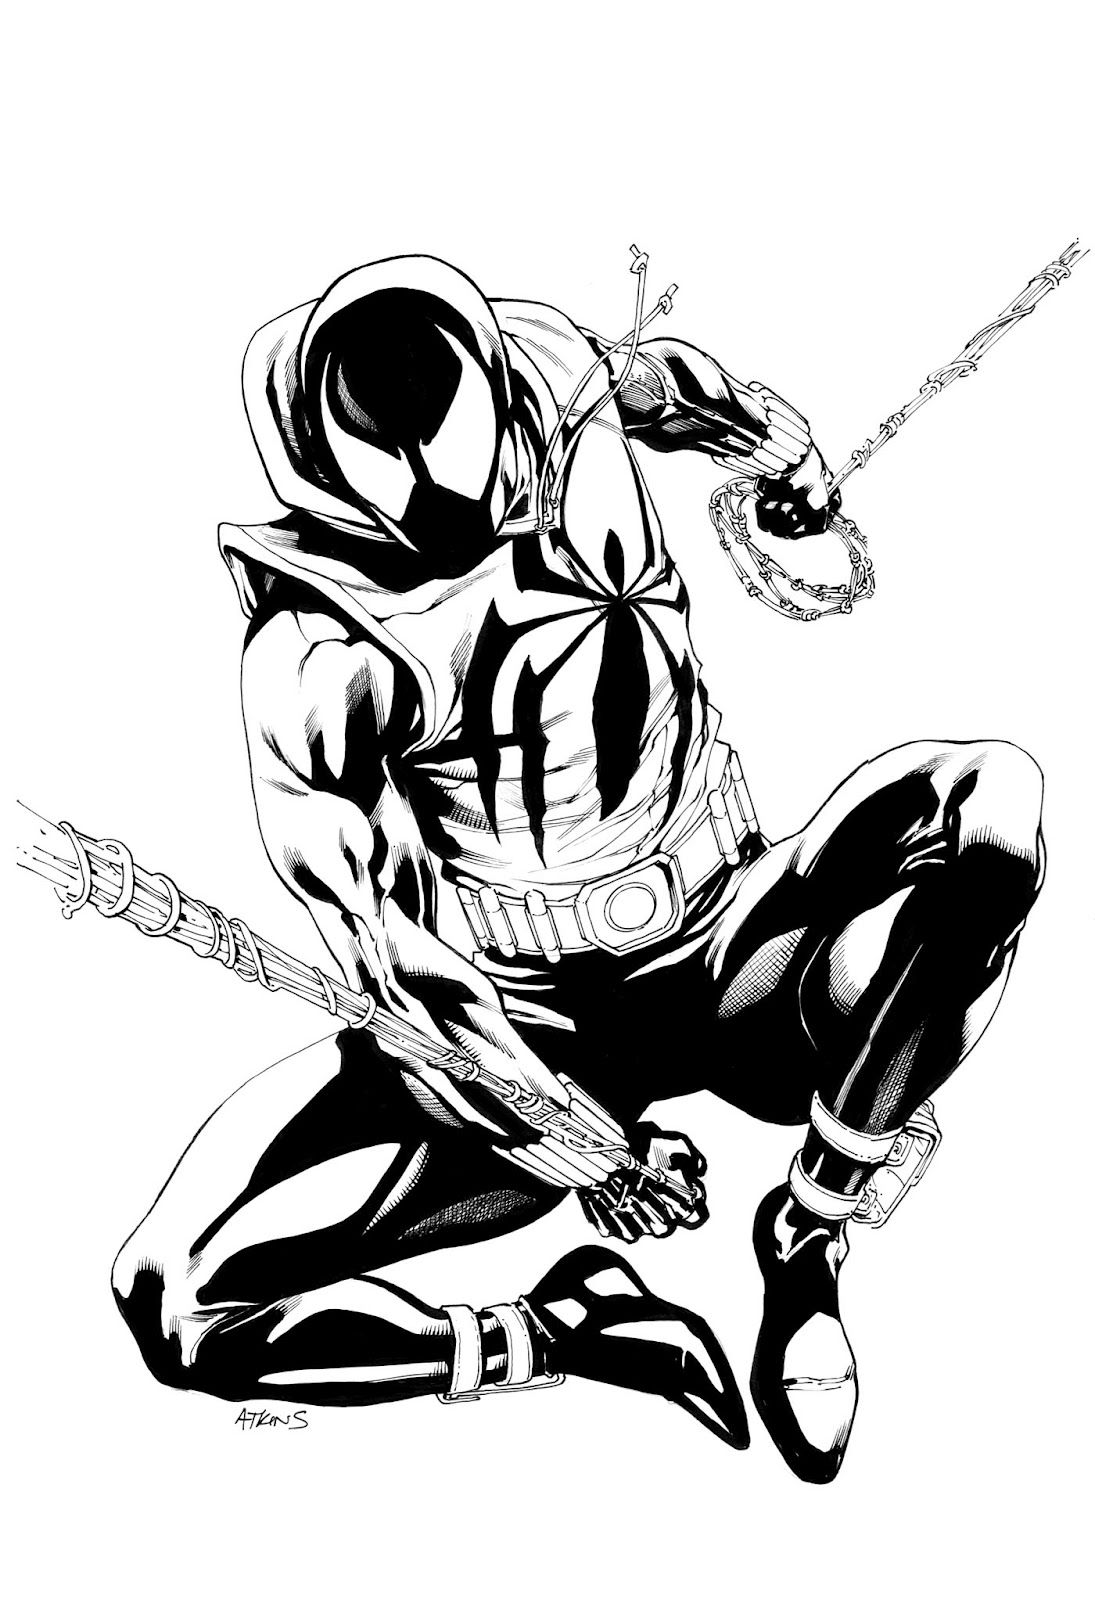 Robert Atkins Art Avengers Scarlet Spiderman Nd Of